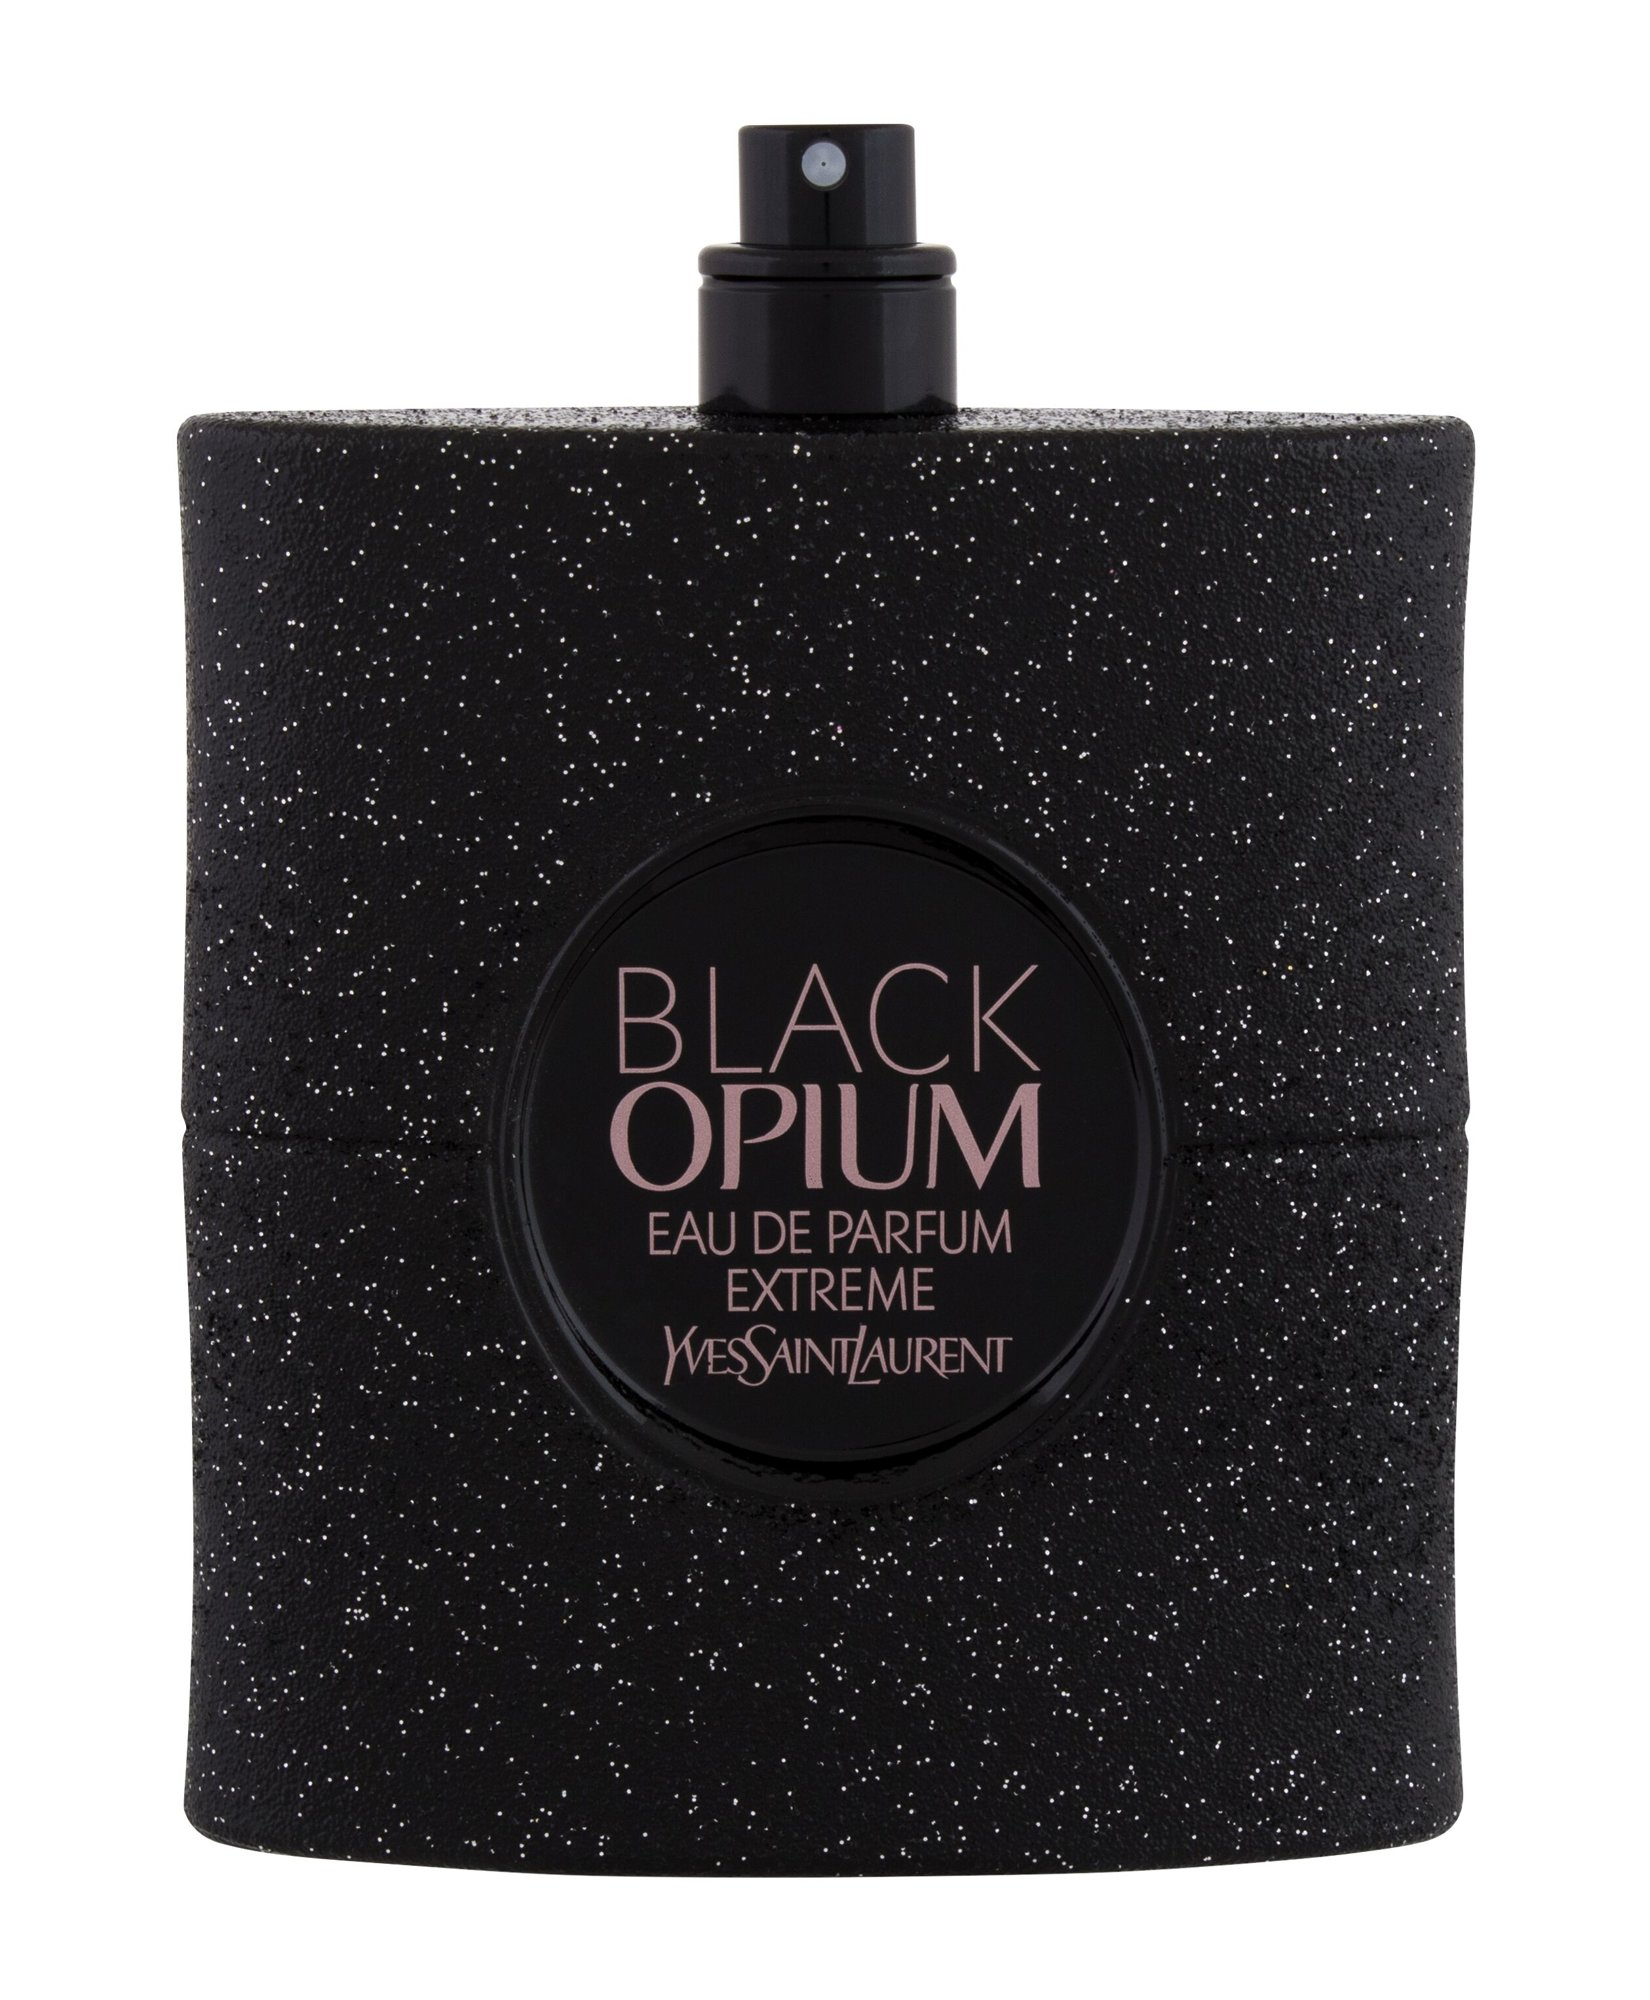 Yves Saint Laurent Black Opium Extreme, Parfumovaná voda 90ml, Tester